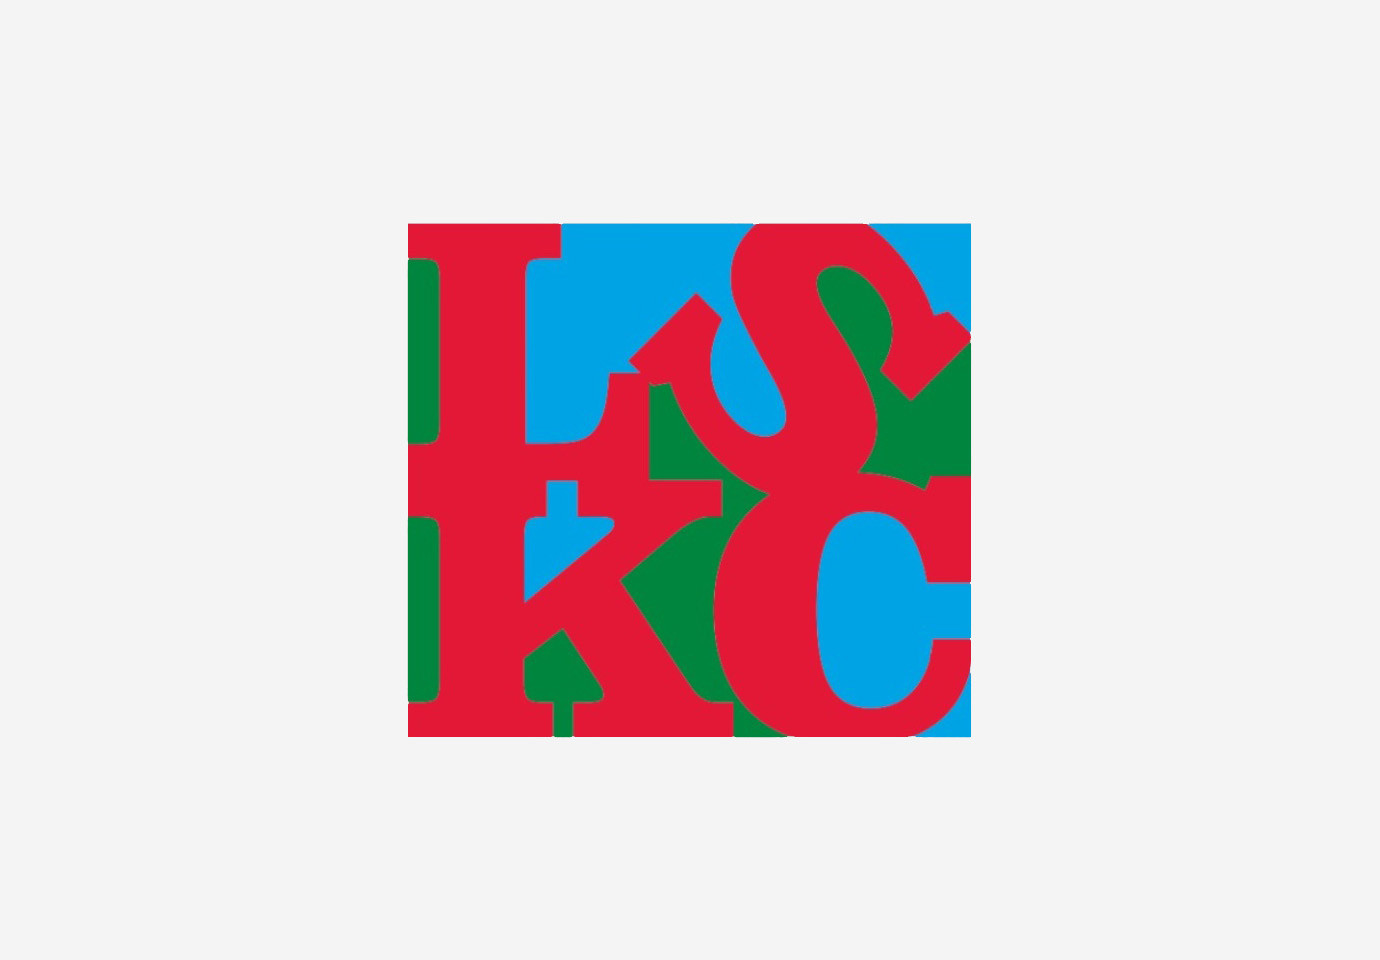 LSKC Summer 2020 registration fee